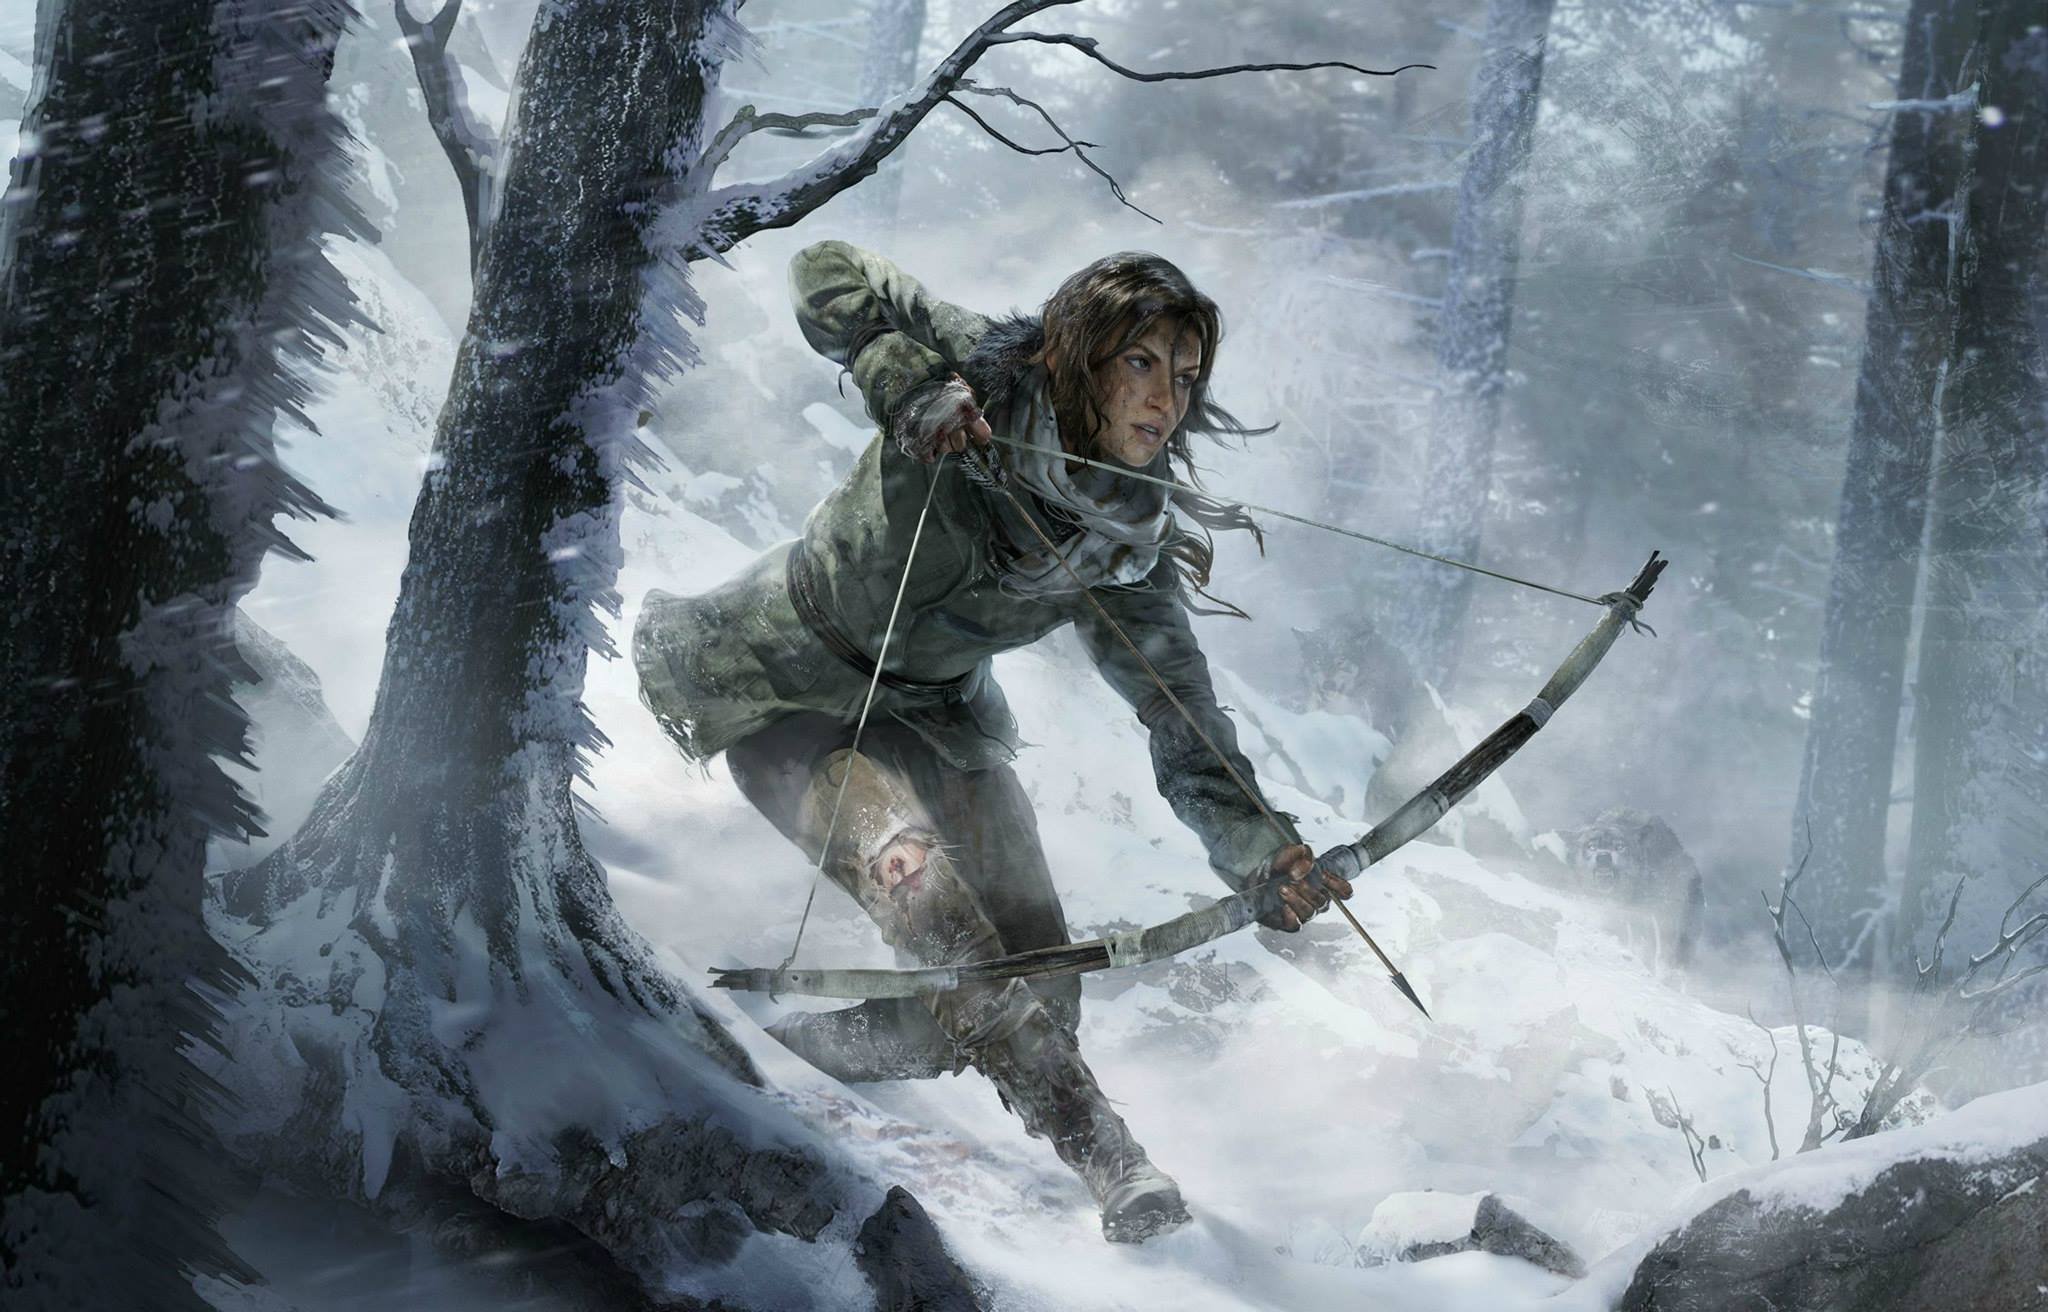 Karen O writes song for new Tomb Raider game